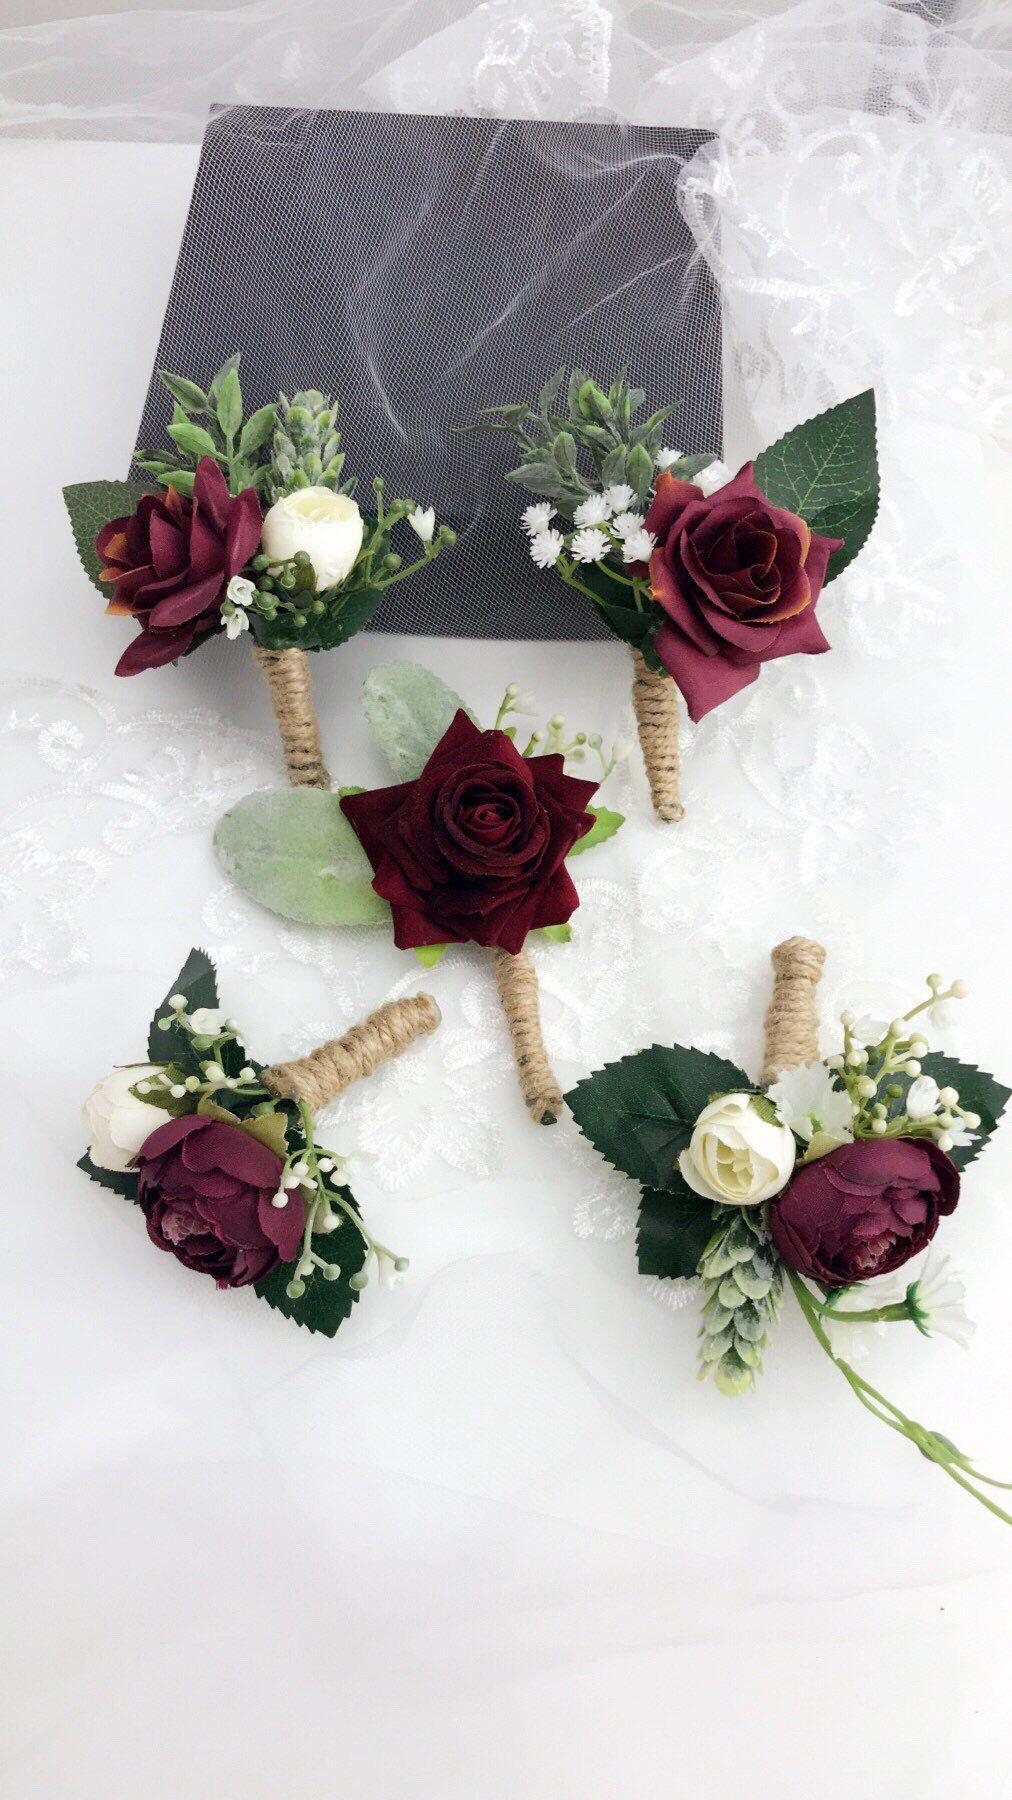 Wedding Bouquet, Bridal Bridesmaids Bouquet, Winter